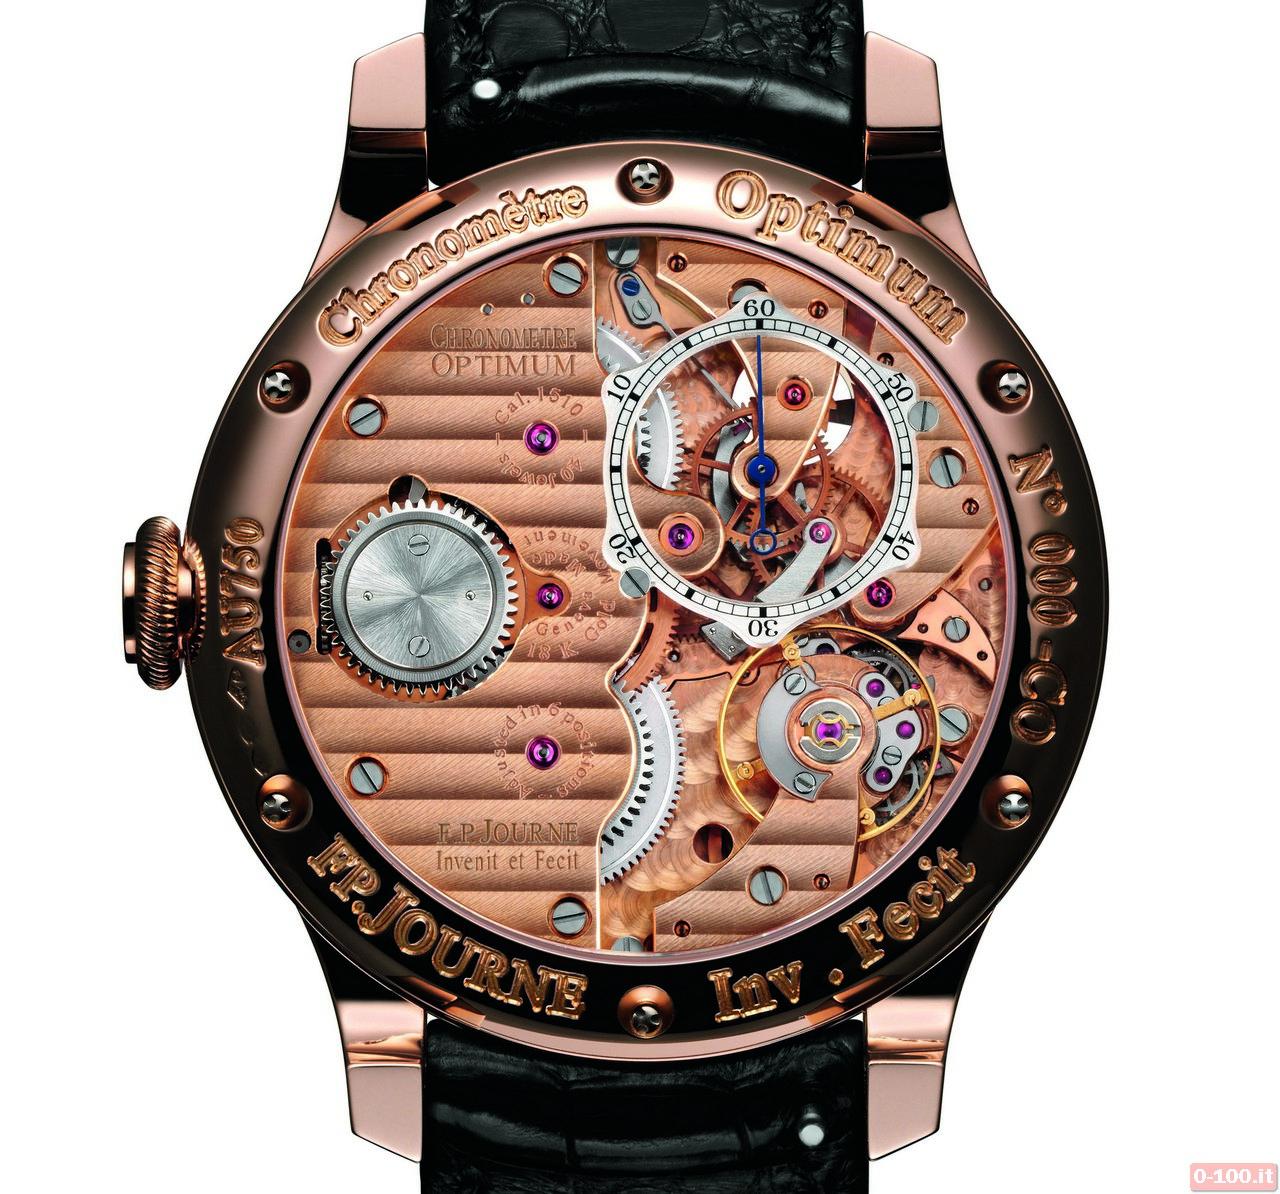 f-p-journe-chronometre-optimum-0-100_3